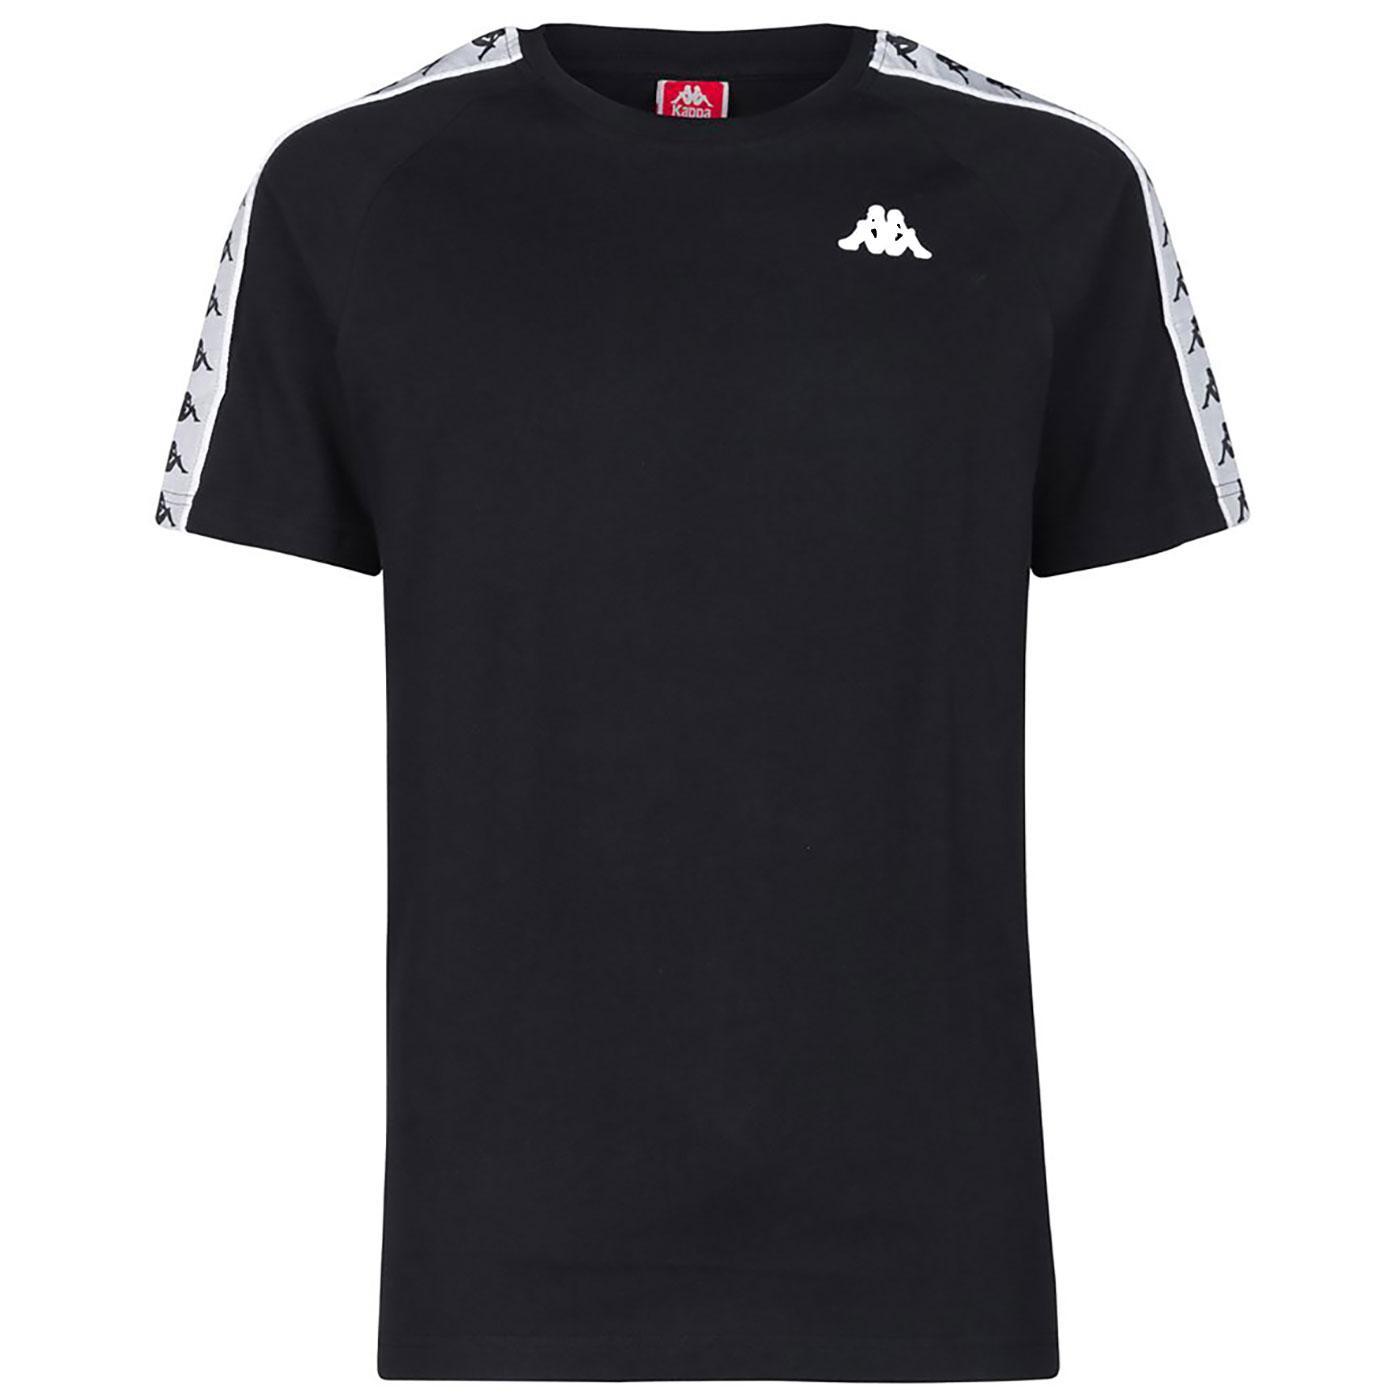 Coen KAPPA Retro 80's Tape Sleeve T-Shirt BLACK